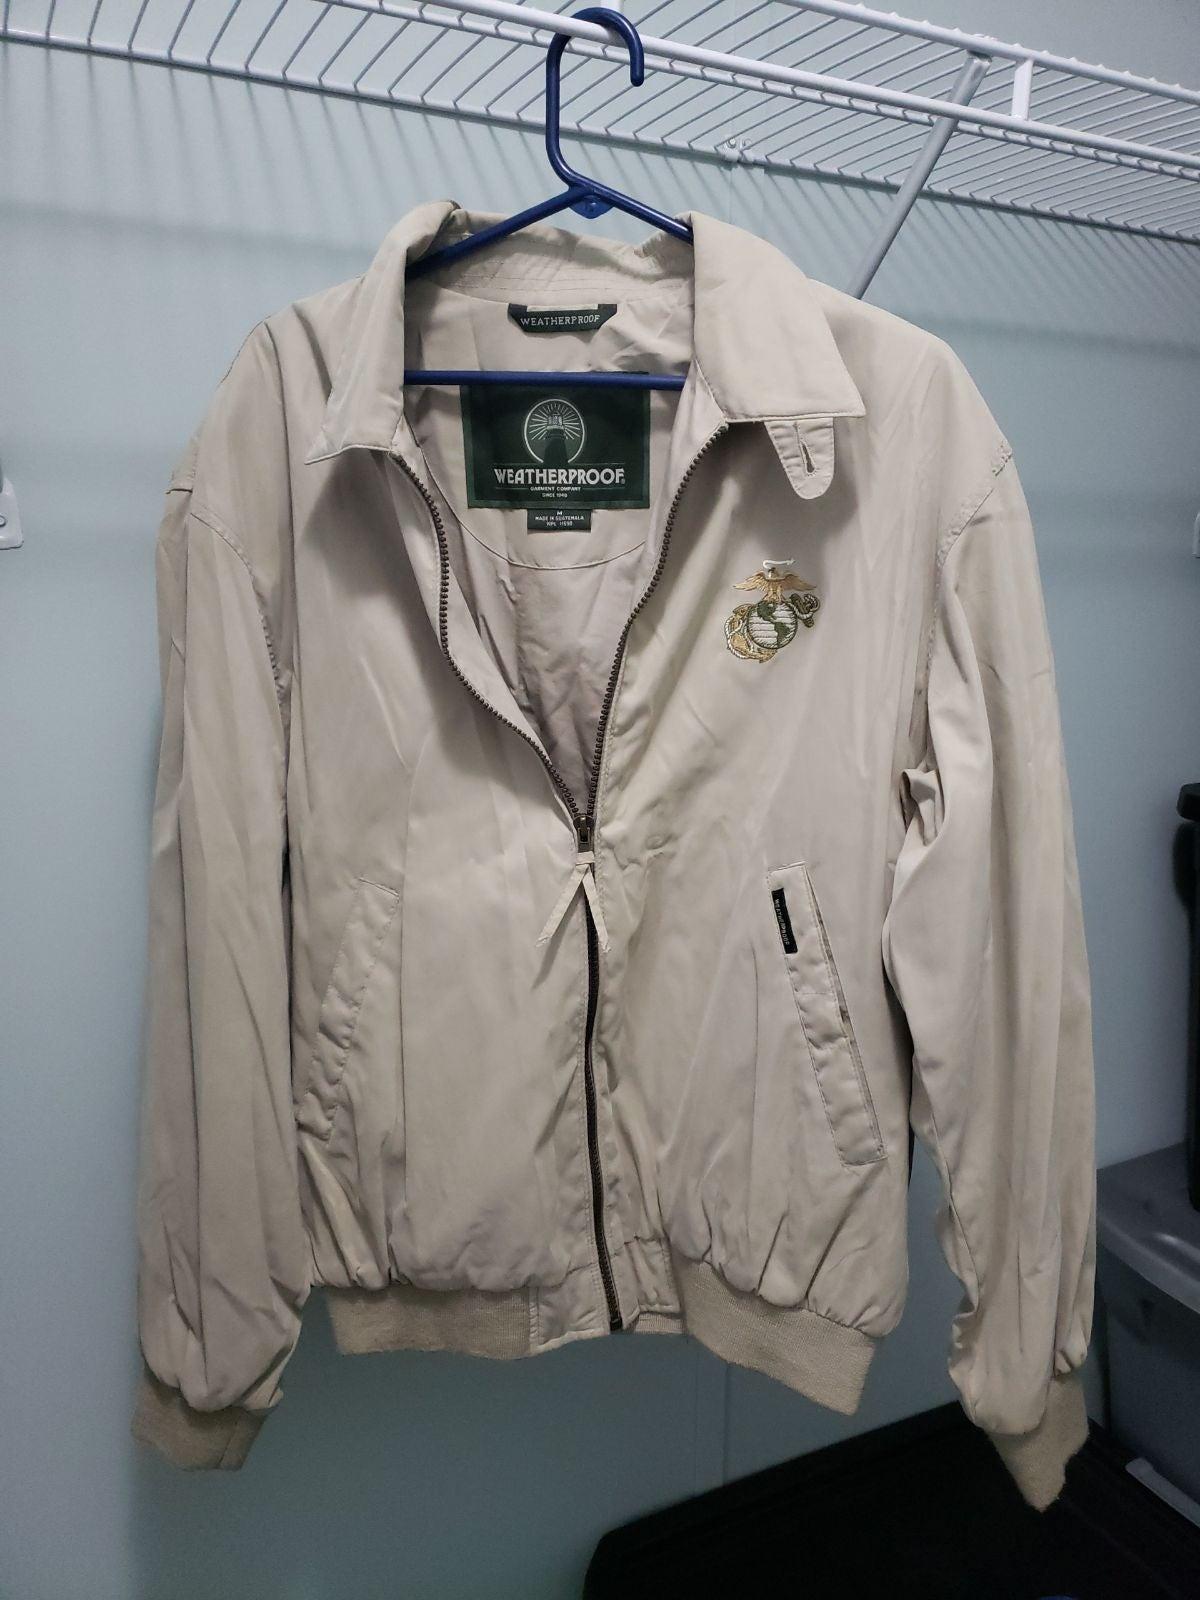 Weatherproof Garment USMC jacket great c